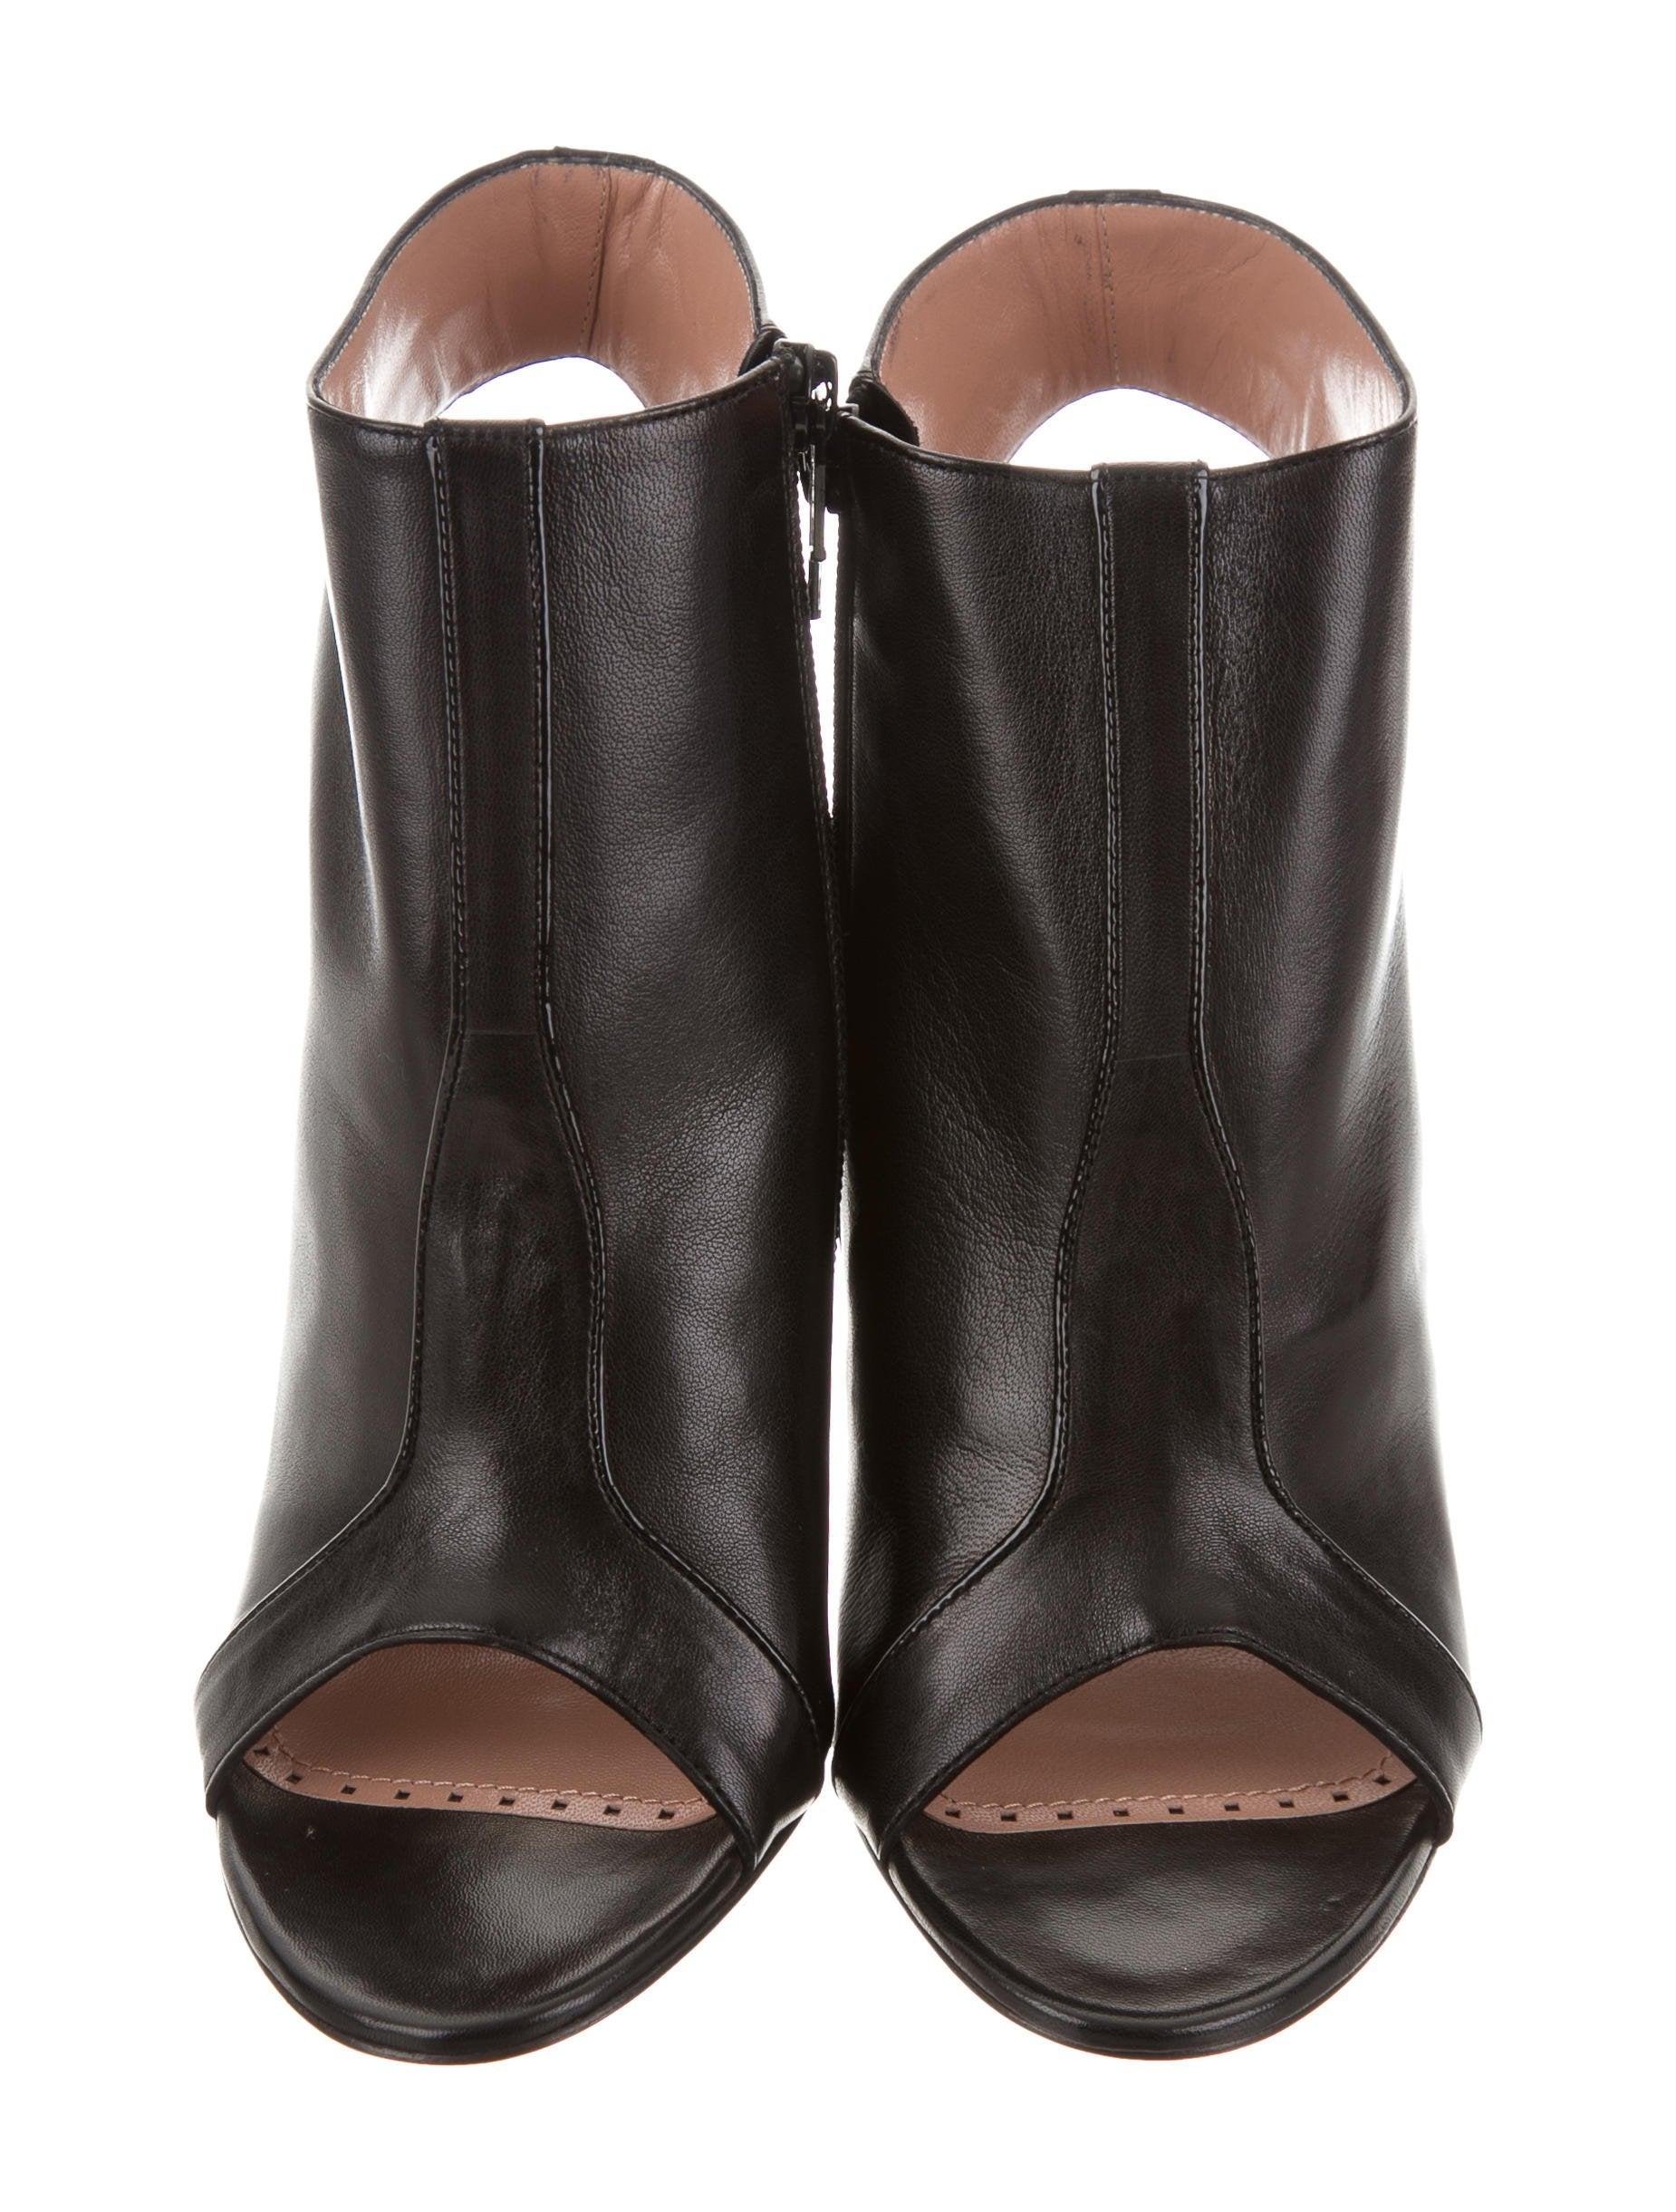 Jean-Michel Cazabat Ophelia Peep-Toe Booties w/ Tags real cheap price clearance pre order WlPiYe1So